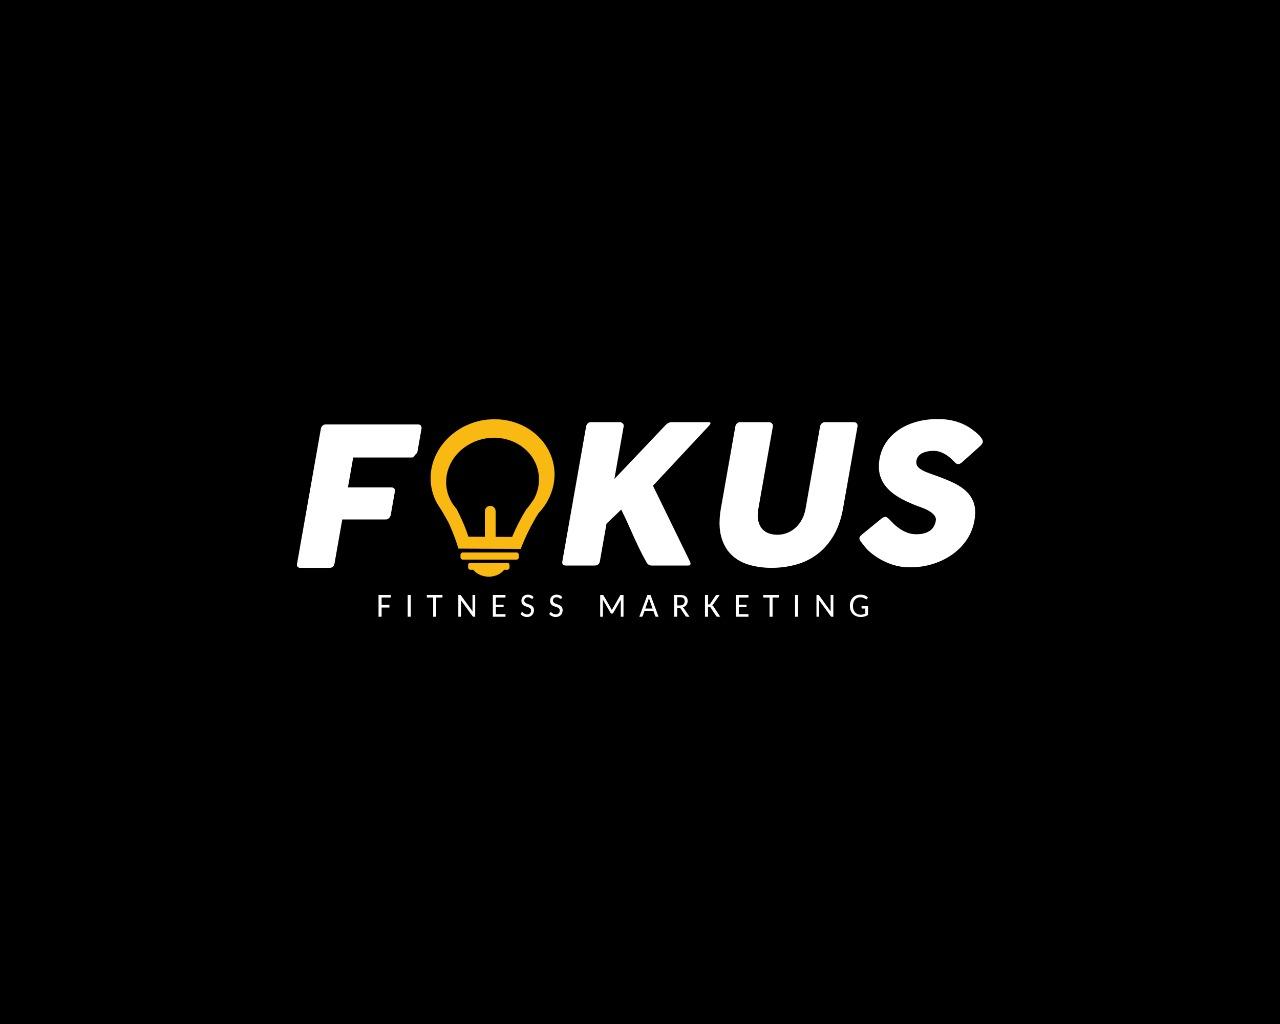 Se creó FoKus, una consultora de marketing digital dirigida a la industria fitness